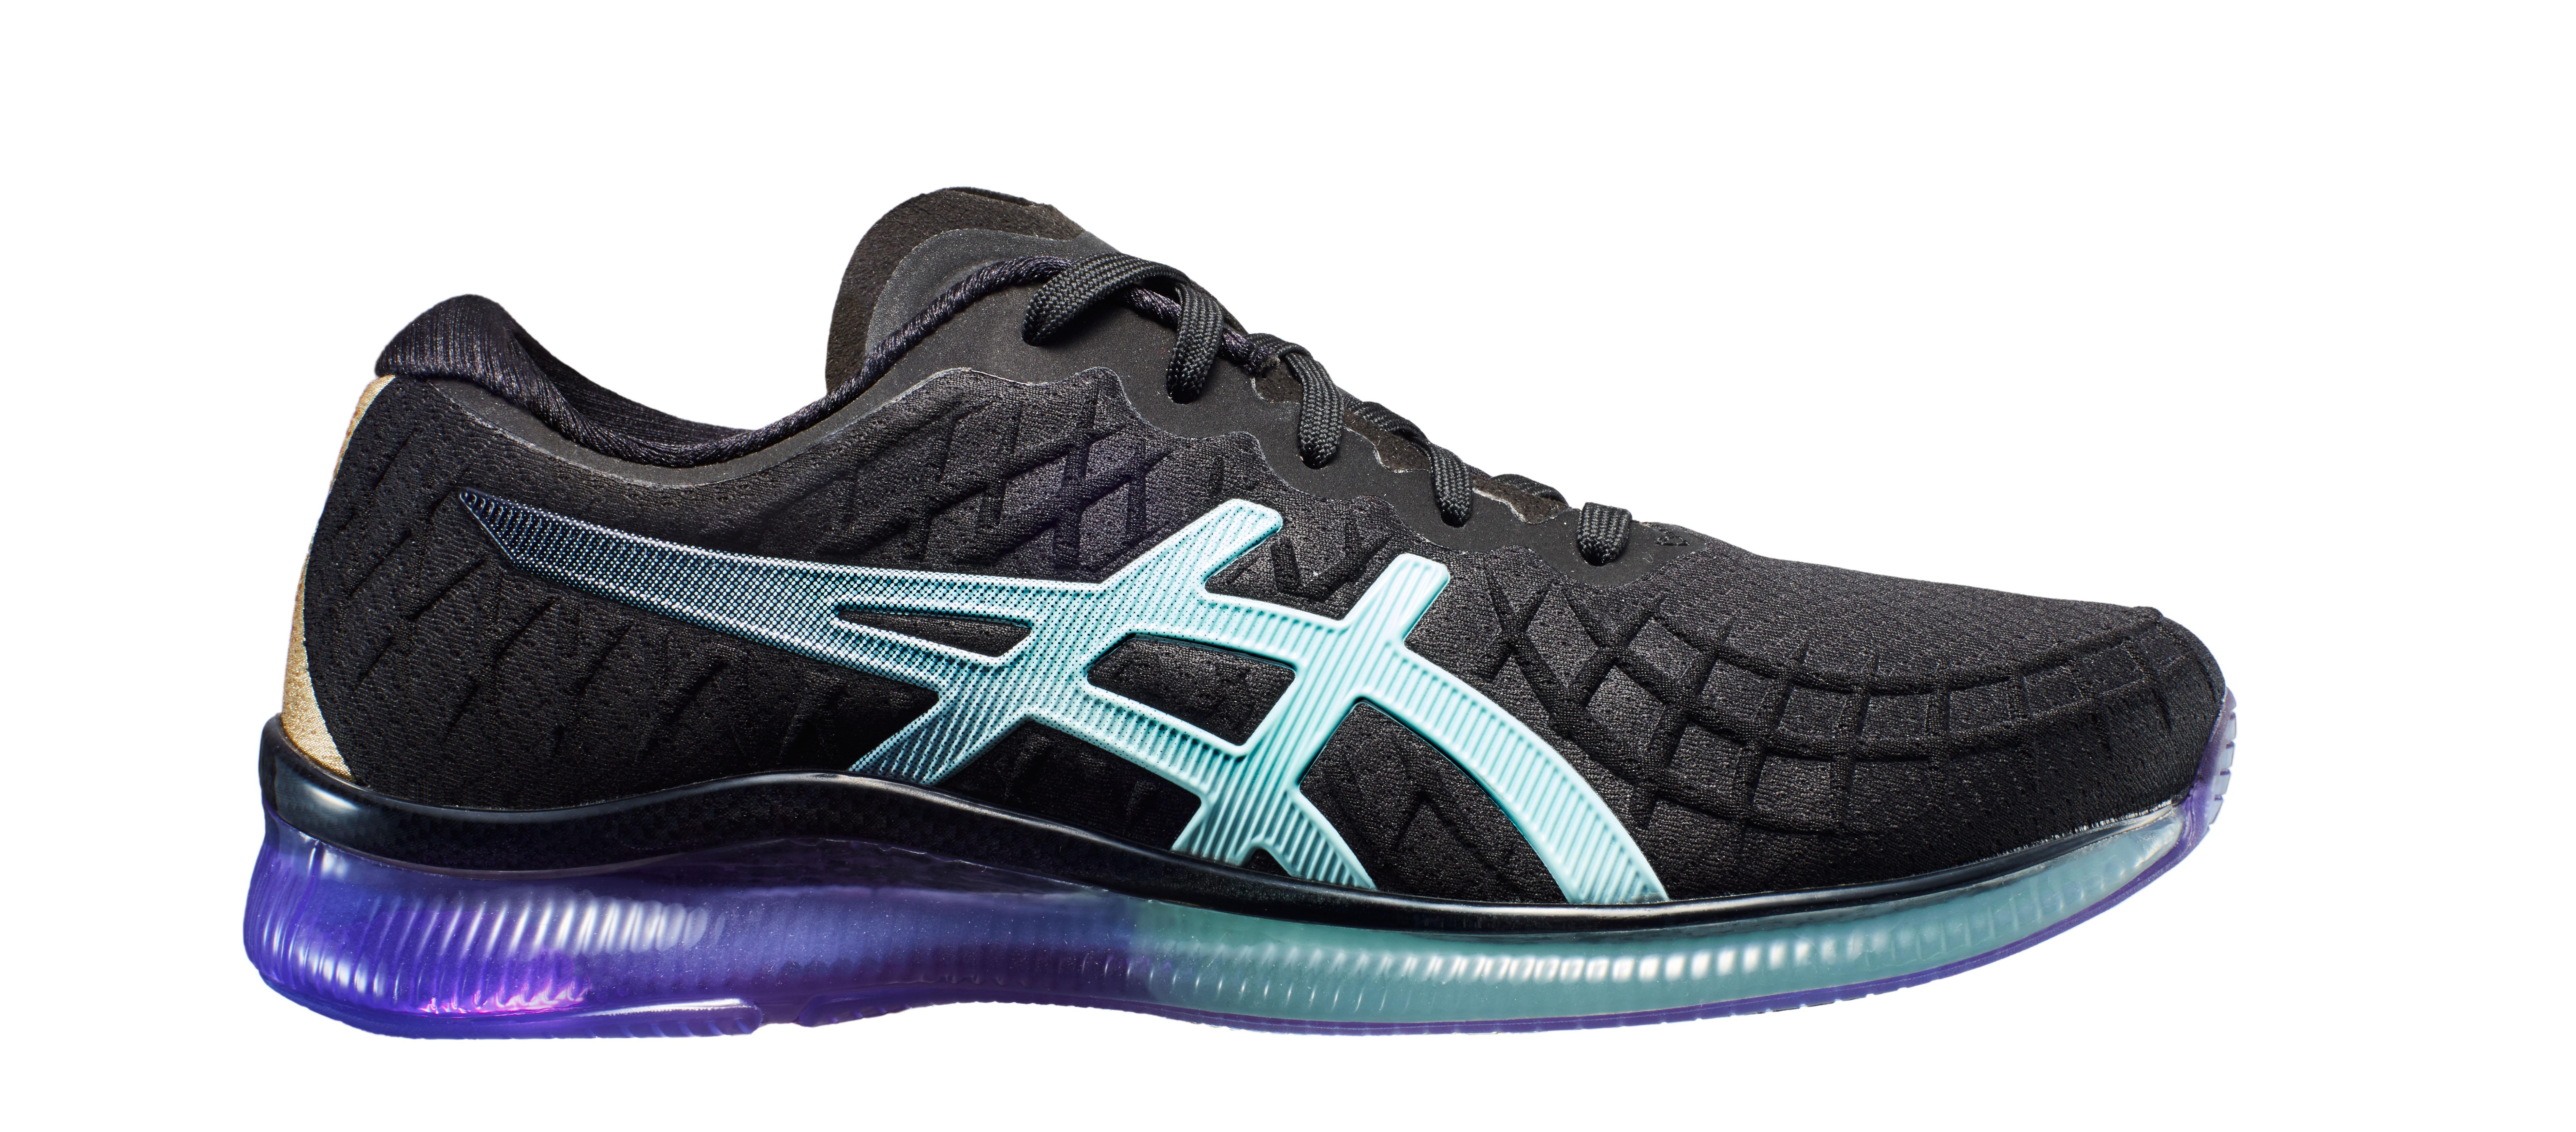 GEL QUANTUM INFINITY Shoes | ASICS (Italy)